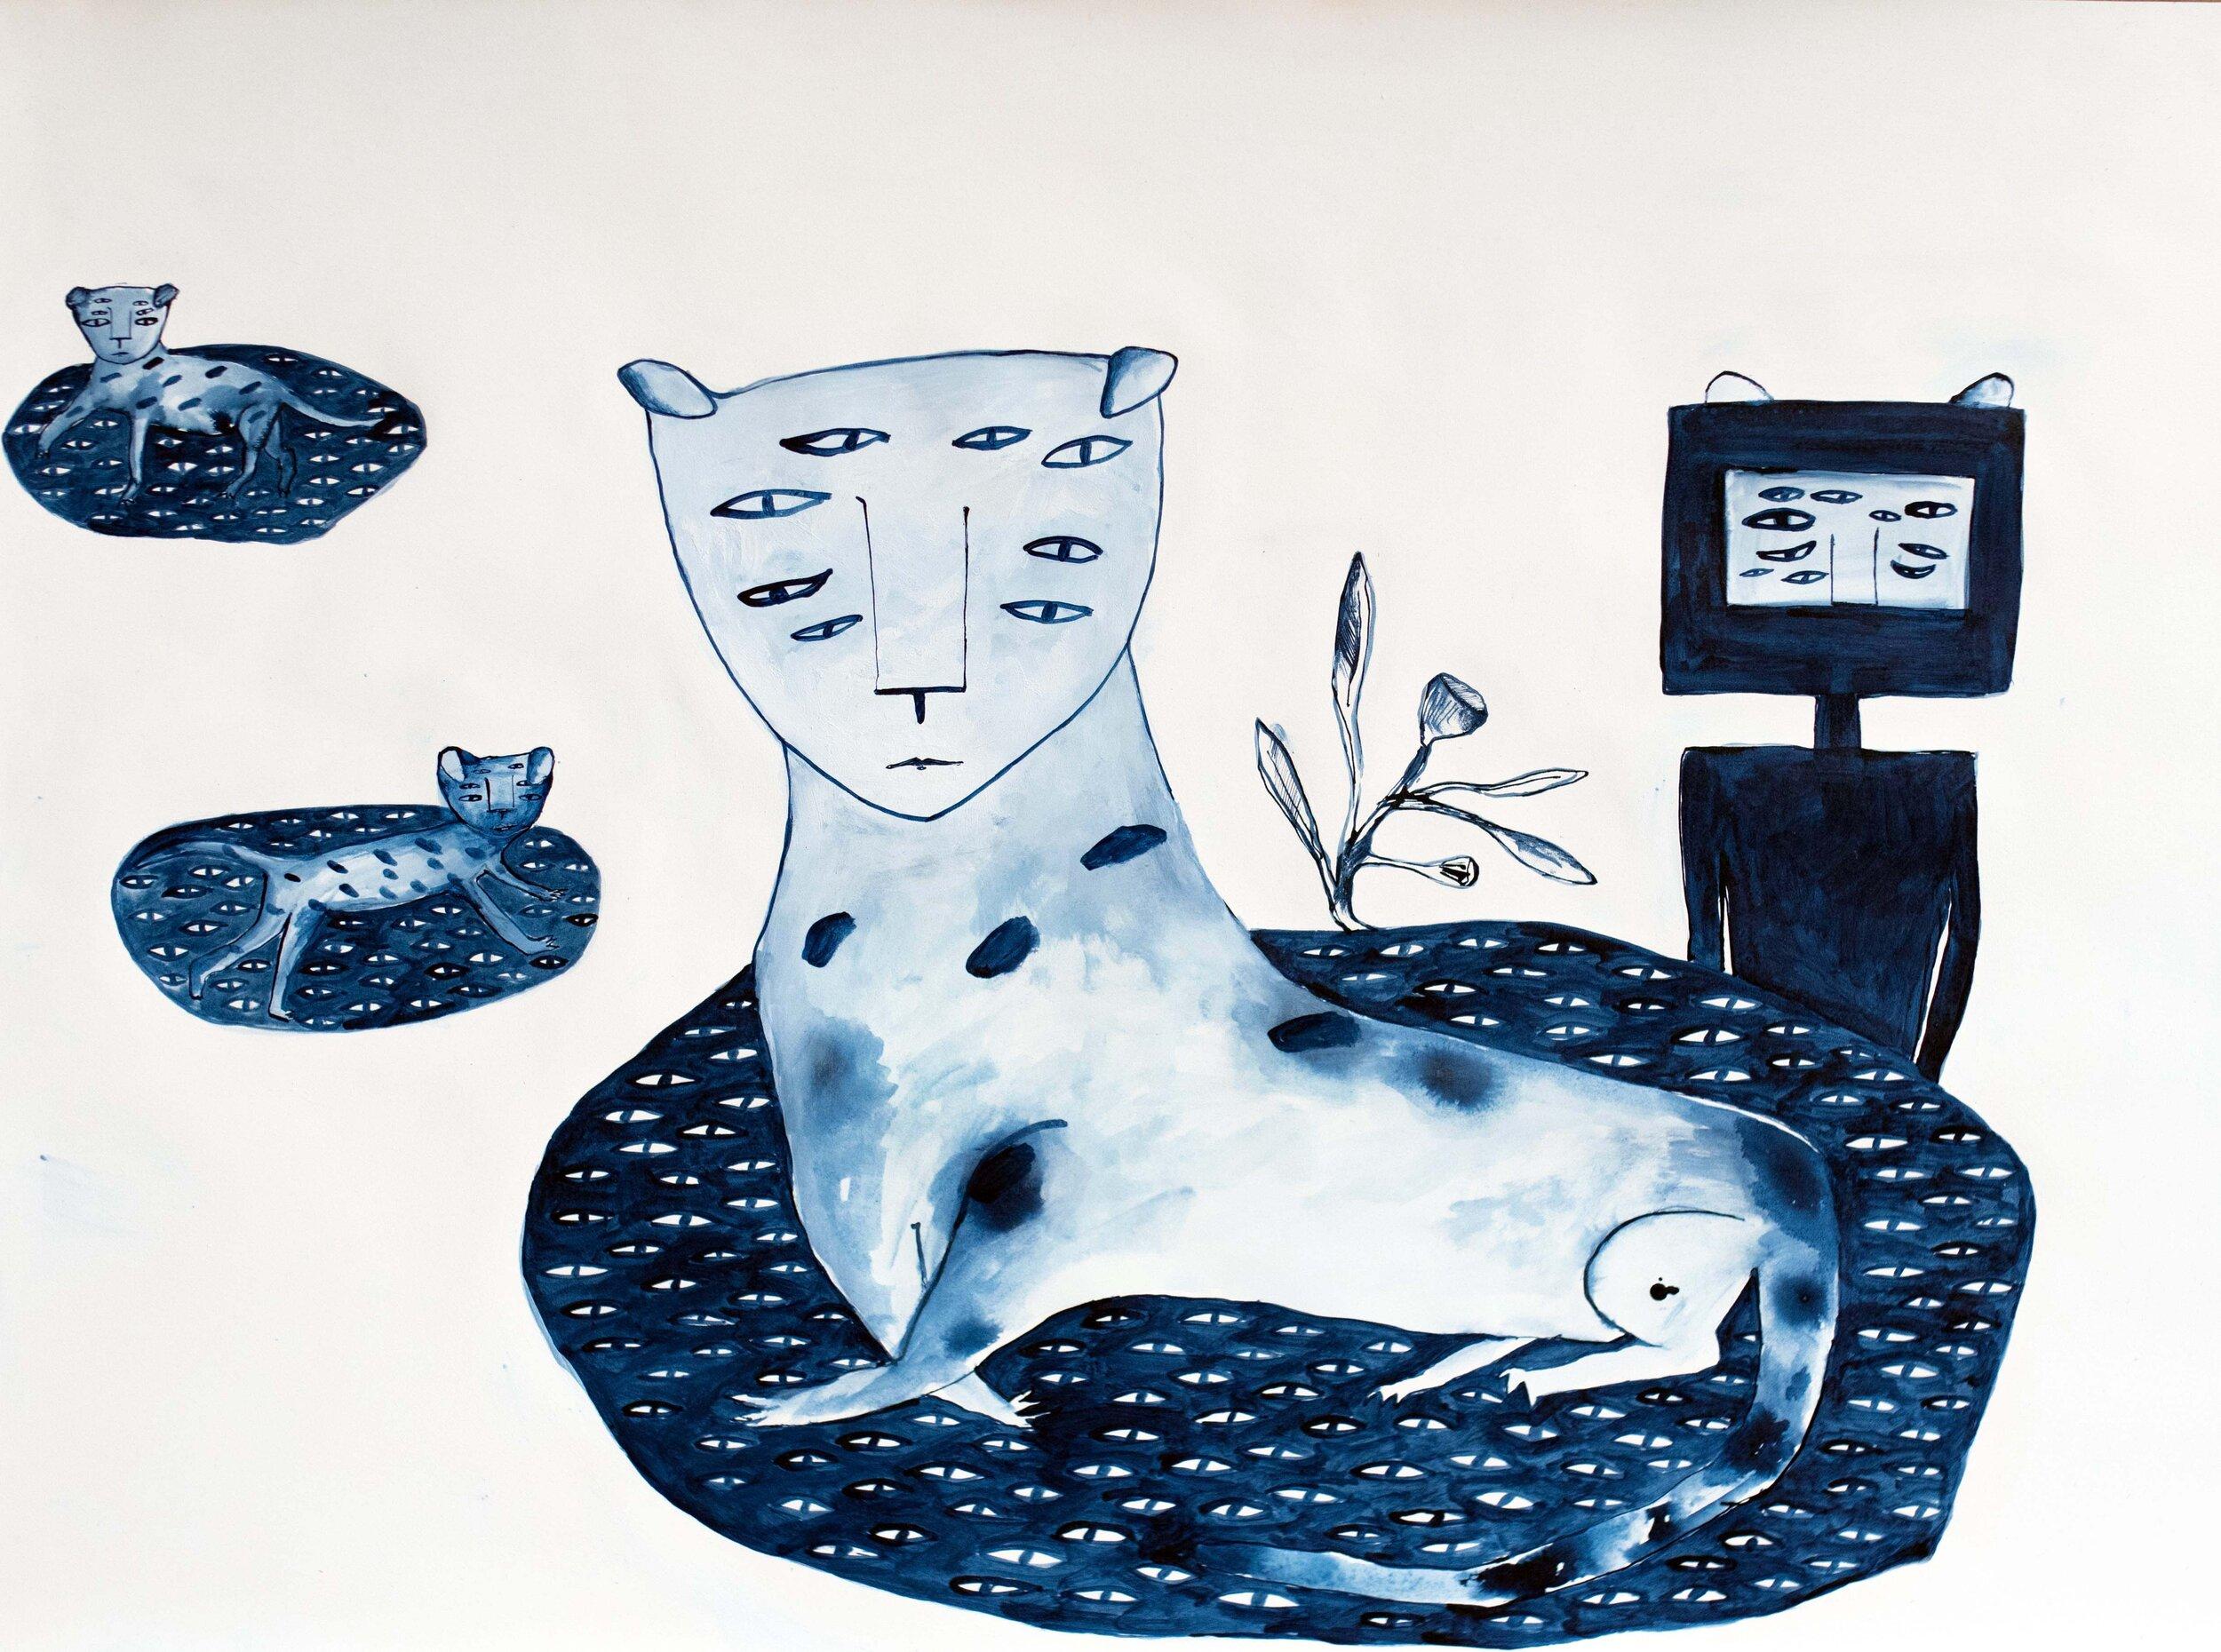 Bertie Blackman, Octavia Leopard 56cm x 85cm, gouache, watercolour, shellac ink, gesso on 300 gsm French cotton rag paper, framed, available